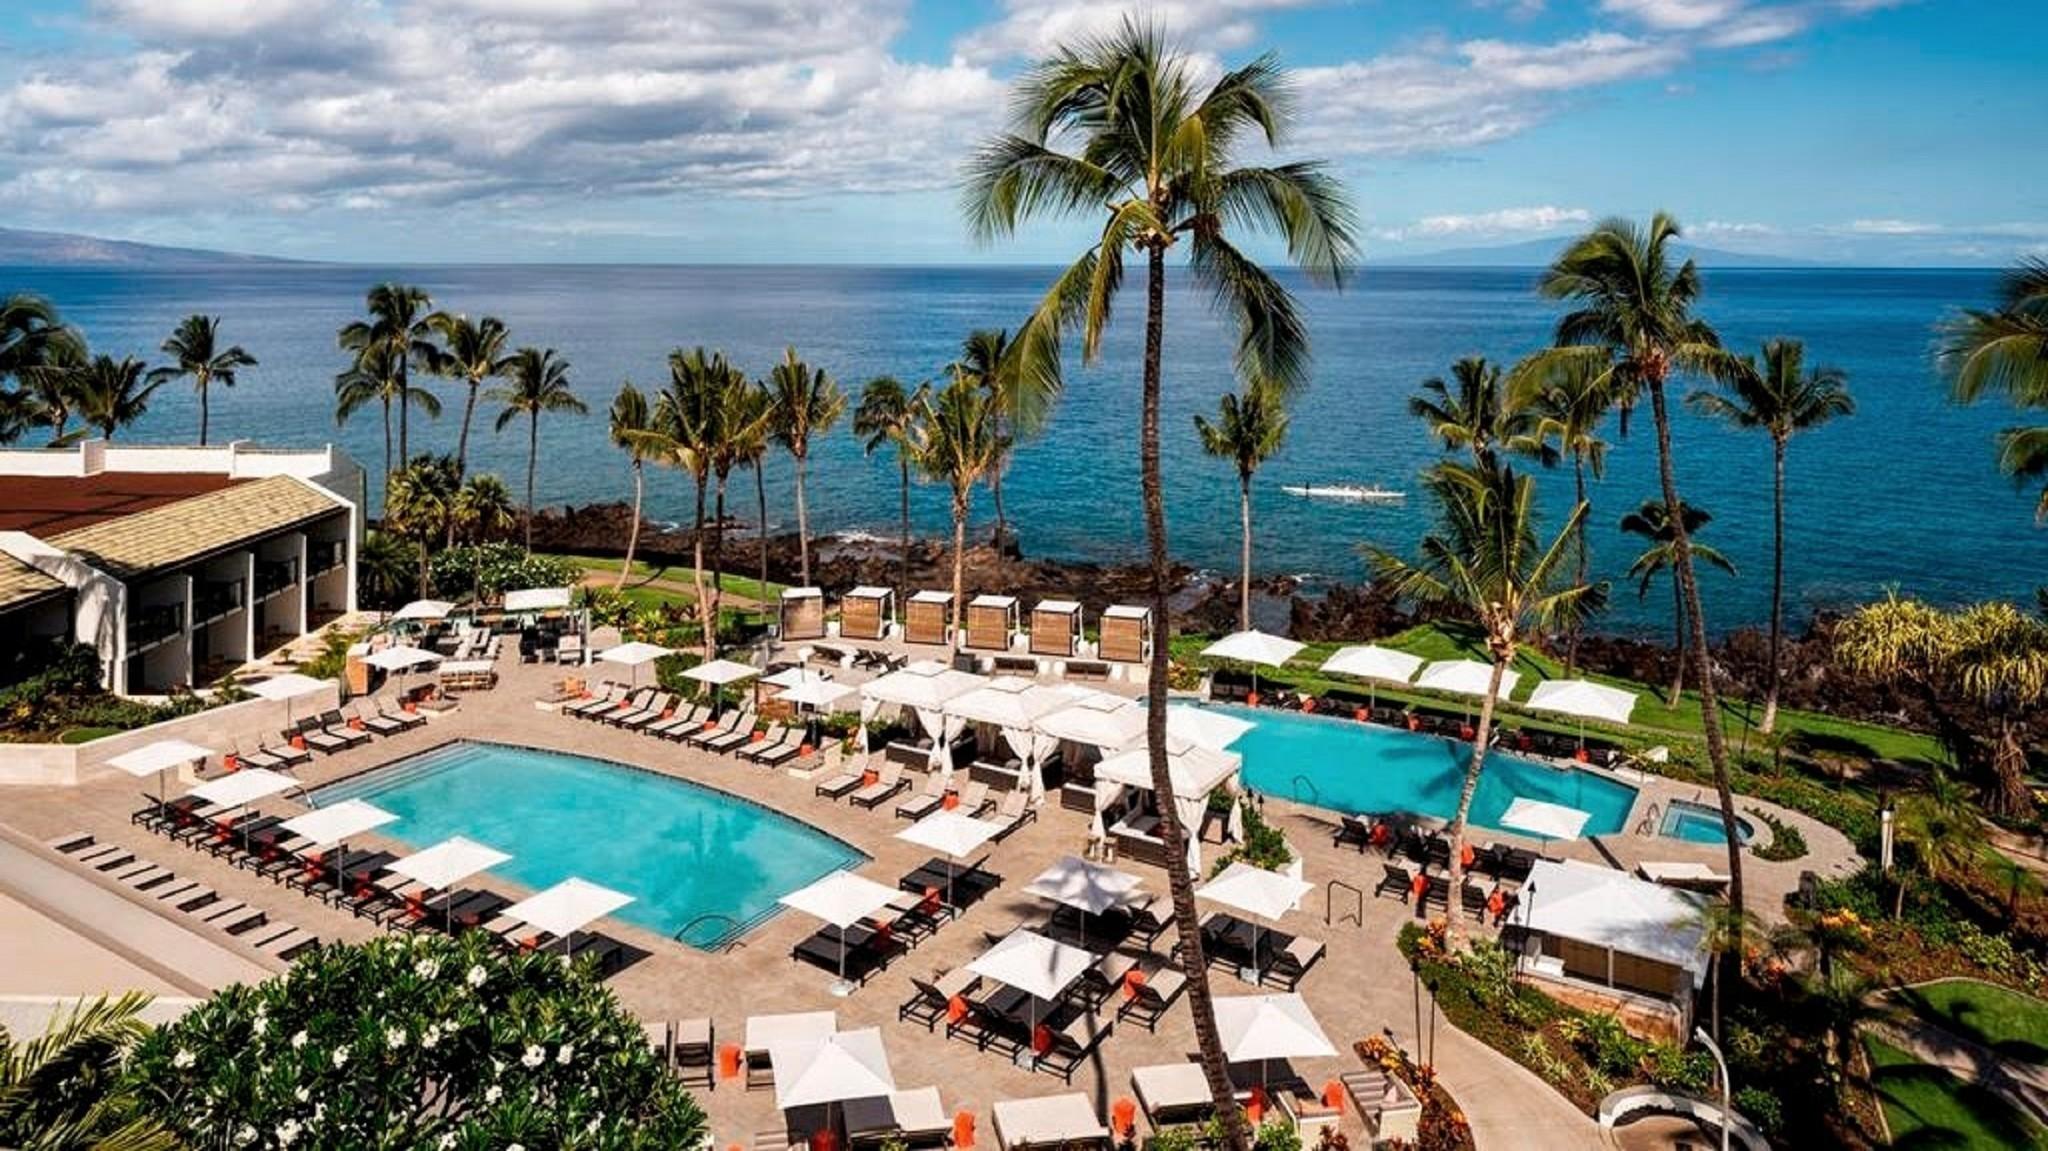 Marriotts Wailea Beach Resort on Maui unveils its 100